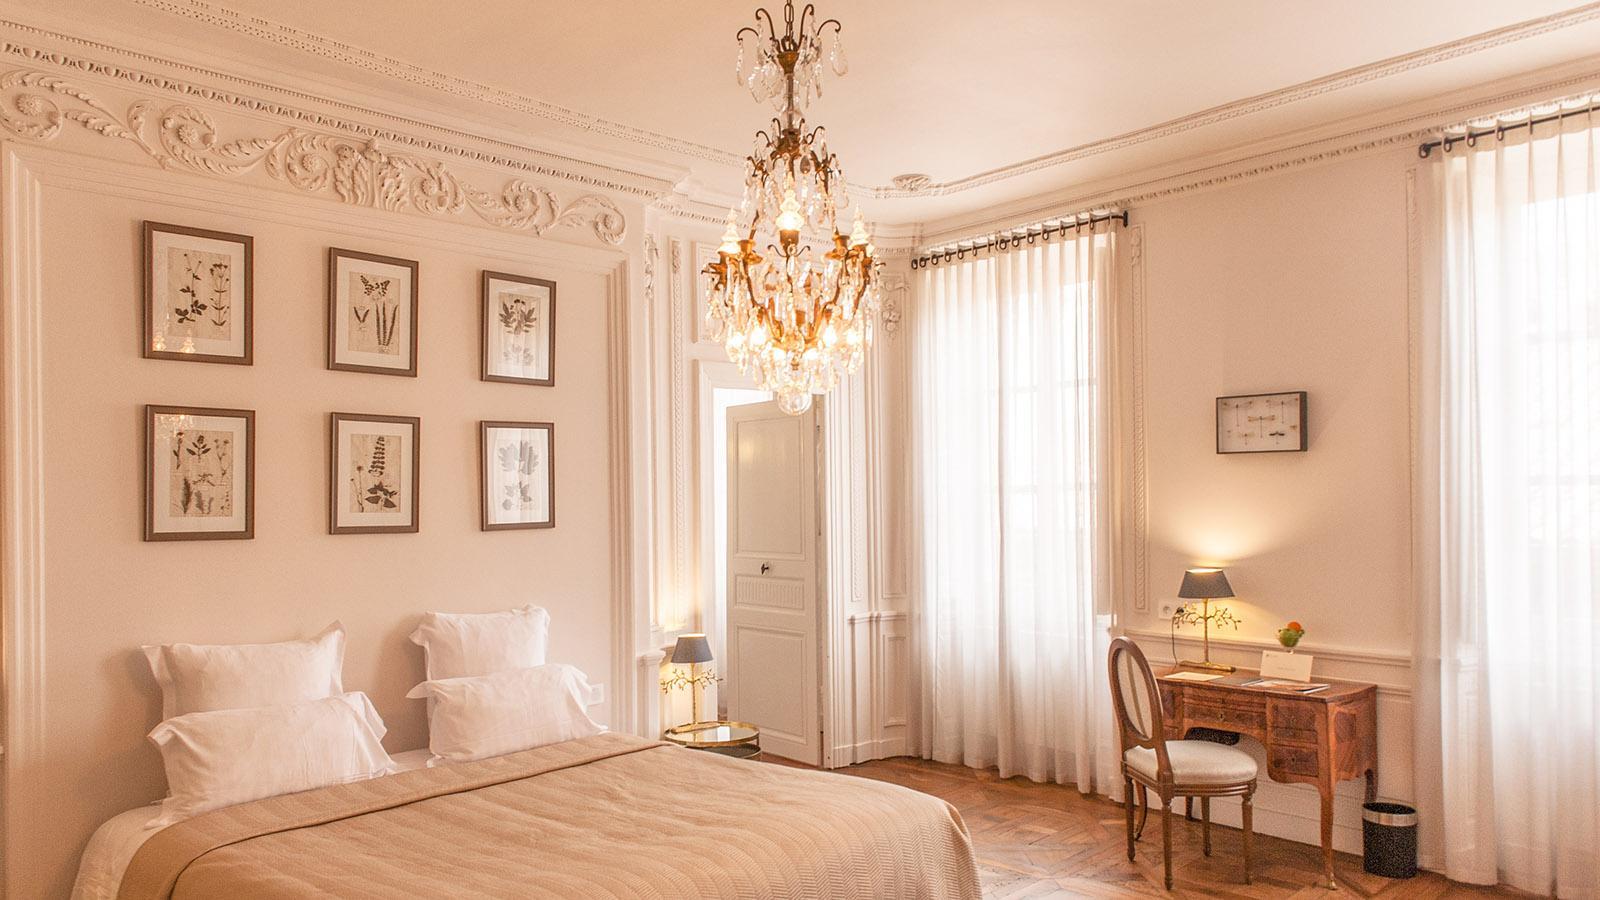 Tournon. Edel: die Zimmer im Hôtel de la Villeon. Foto: Hilke Maunder